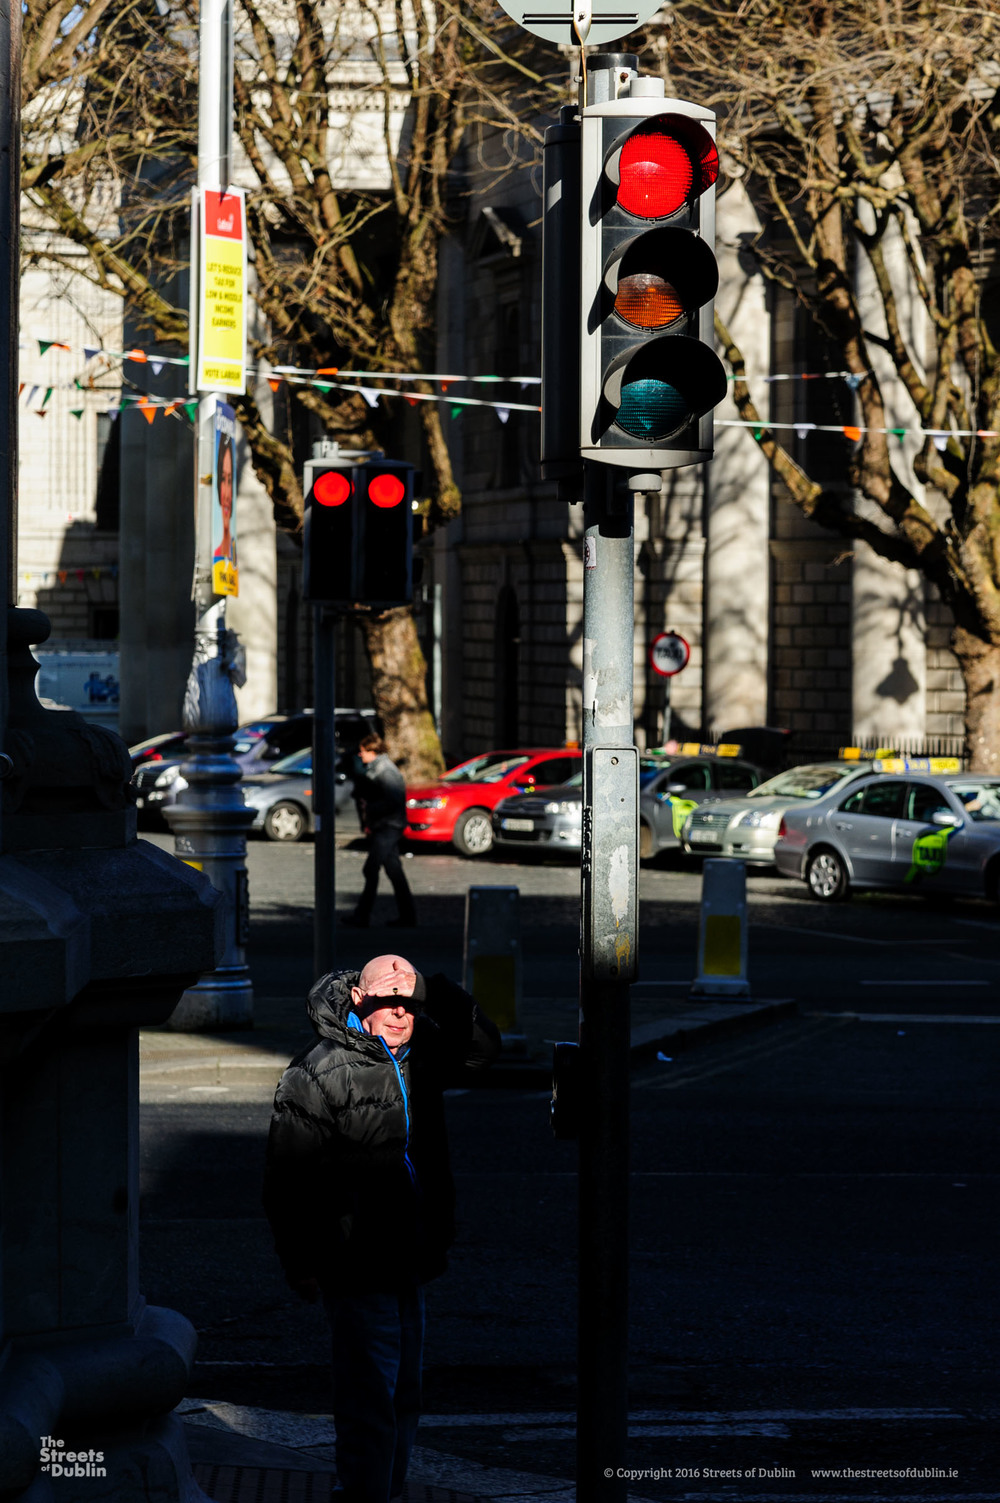 Streets-of-Dublin-Photo-1415.jpg